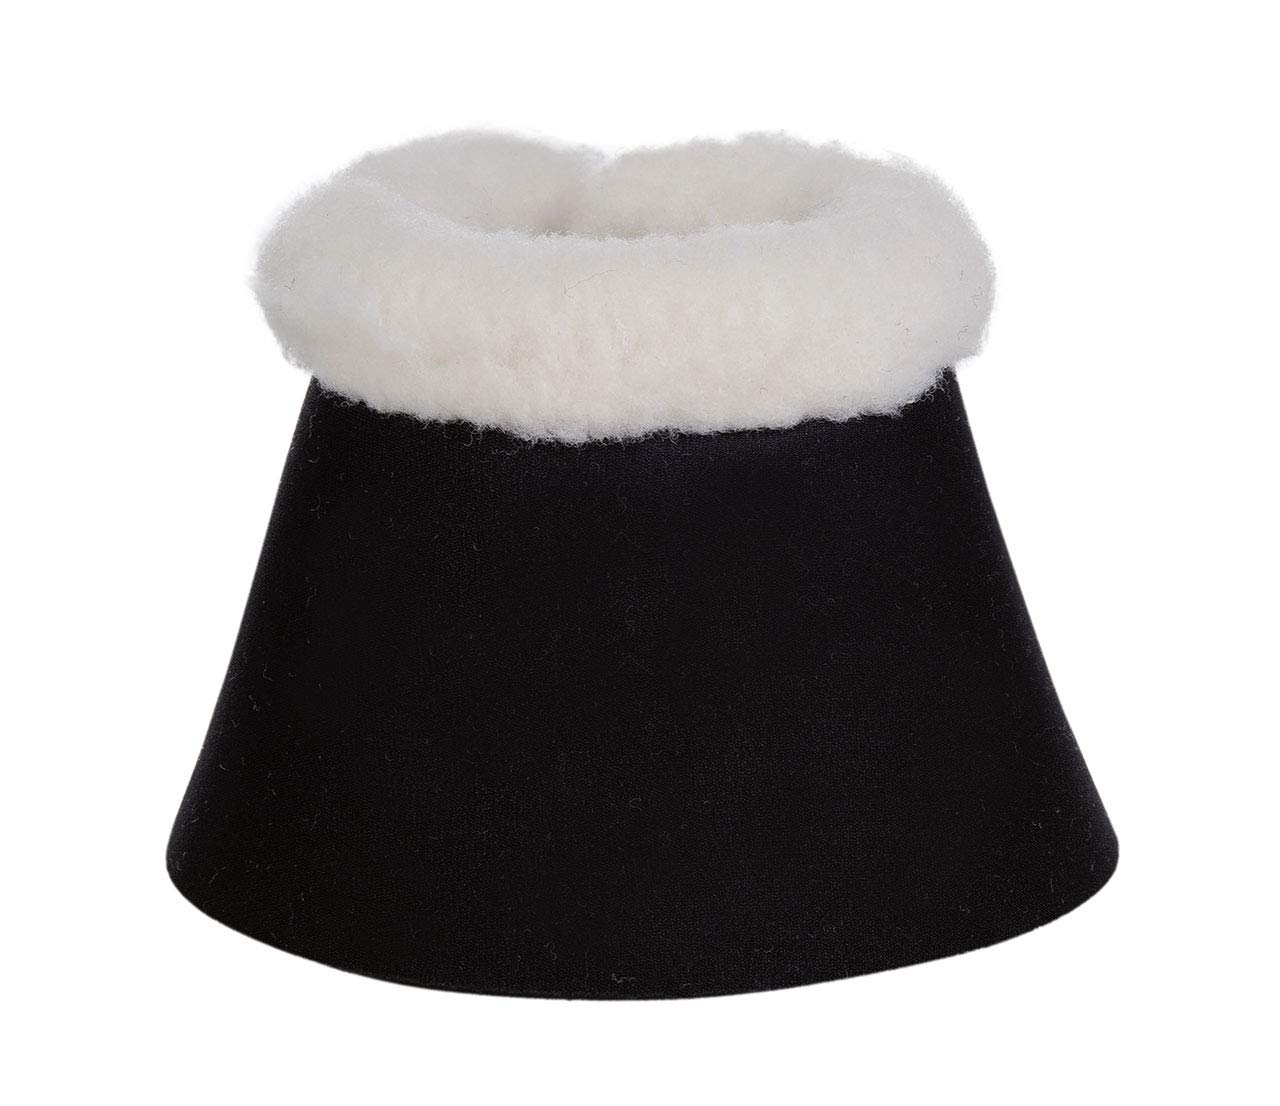 Hufglocke -Comfort- mit Polsterung Warmblut dunkelbraun HKM 85862100